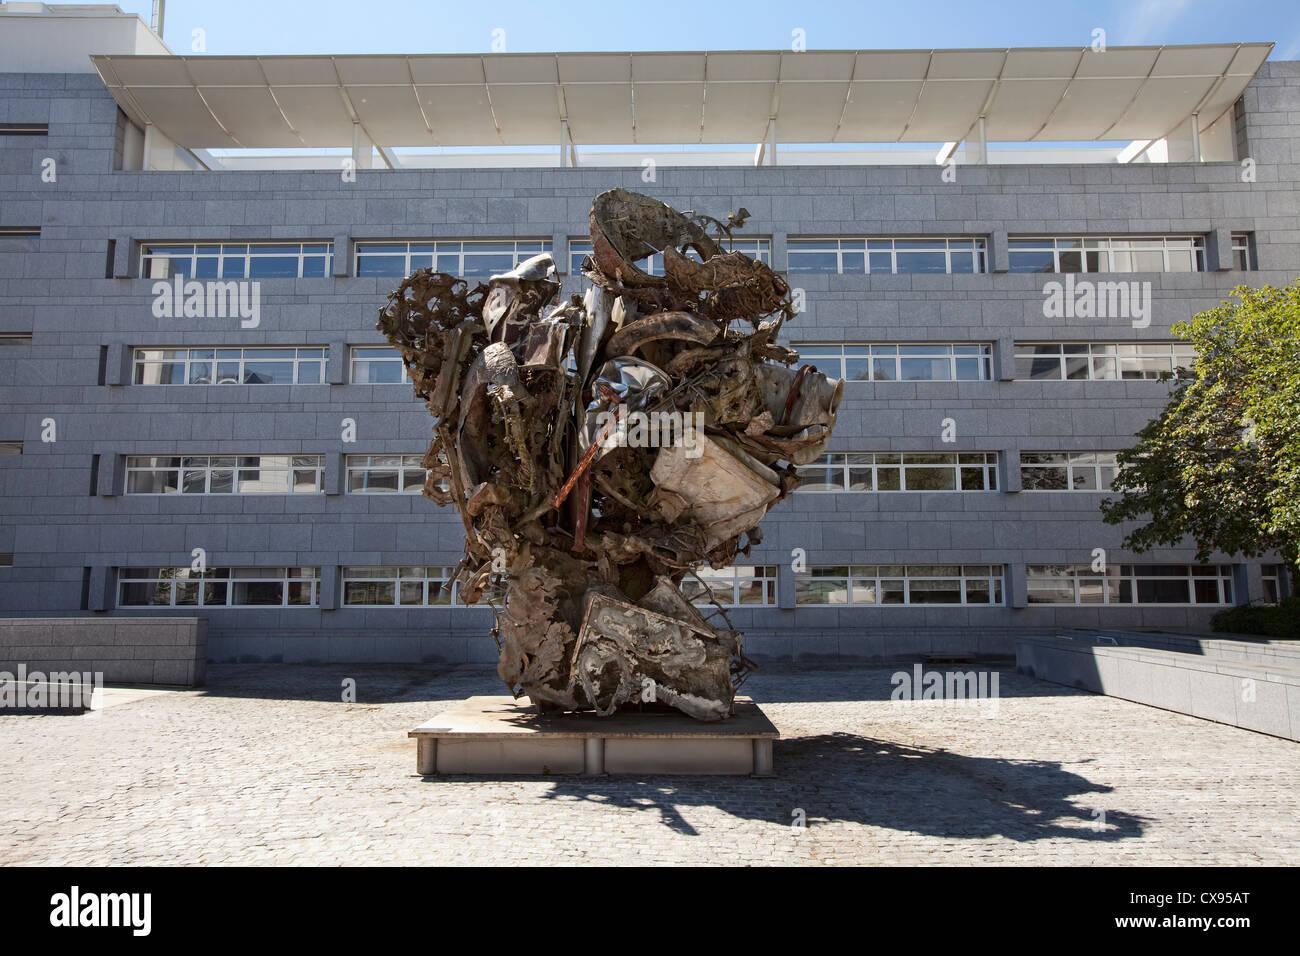 UniCredit International Bank building, Kirchberg district, Luxembourg, Europe, Sarreguemines von Frank Stella Stock Photo